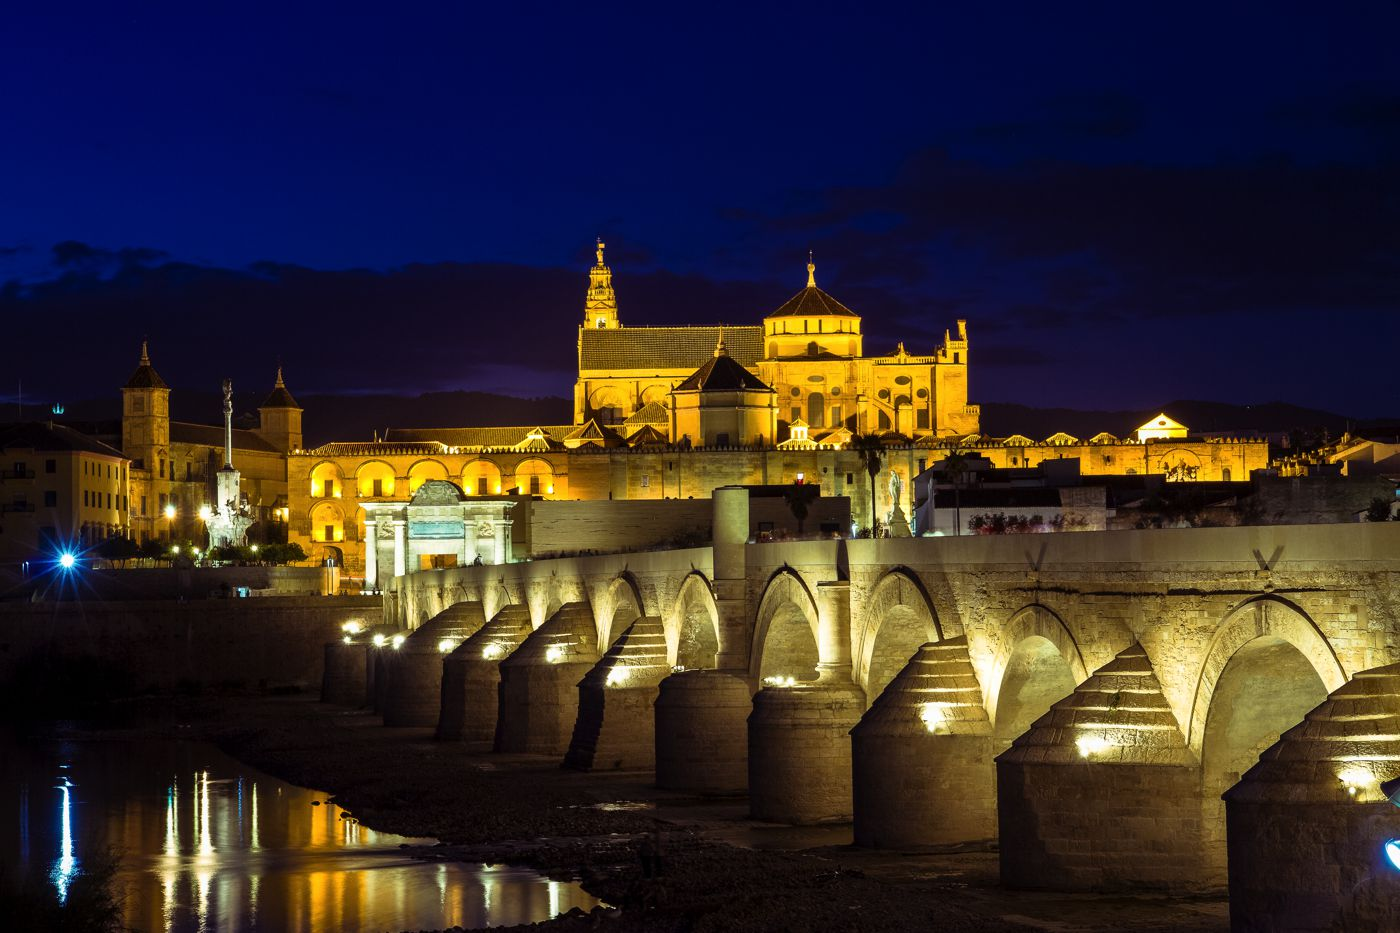 Seville-spain1.jpg Alhambra_at_dusk_Granada_Spain.jpg Catedral_Salamanca_A&I.jpg Spain.Santiago.de.Compostela.Obradoiro.jpg Toledo_Skyline_Panorama,_Spain_-_Dec_2006.jpg Mosque_Cordoba.jpg Catedral_valencia.jpg Madrid Palacio_de_Comunicaciones_-_07.jpg Barcelona.jpg (6)